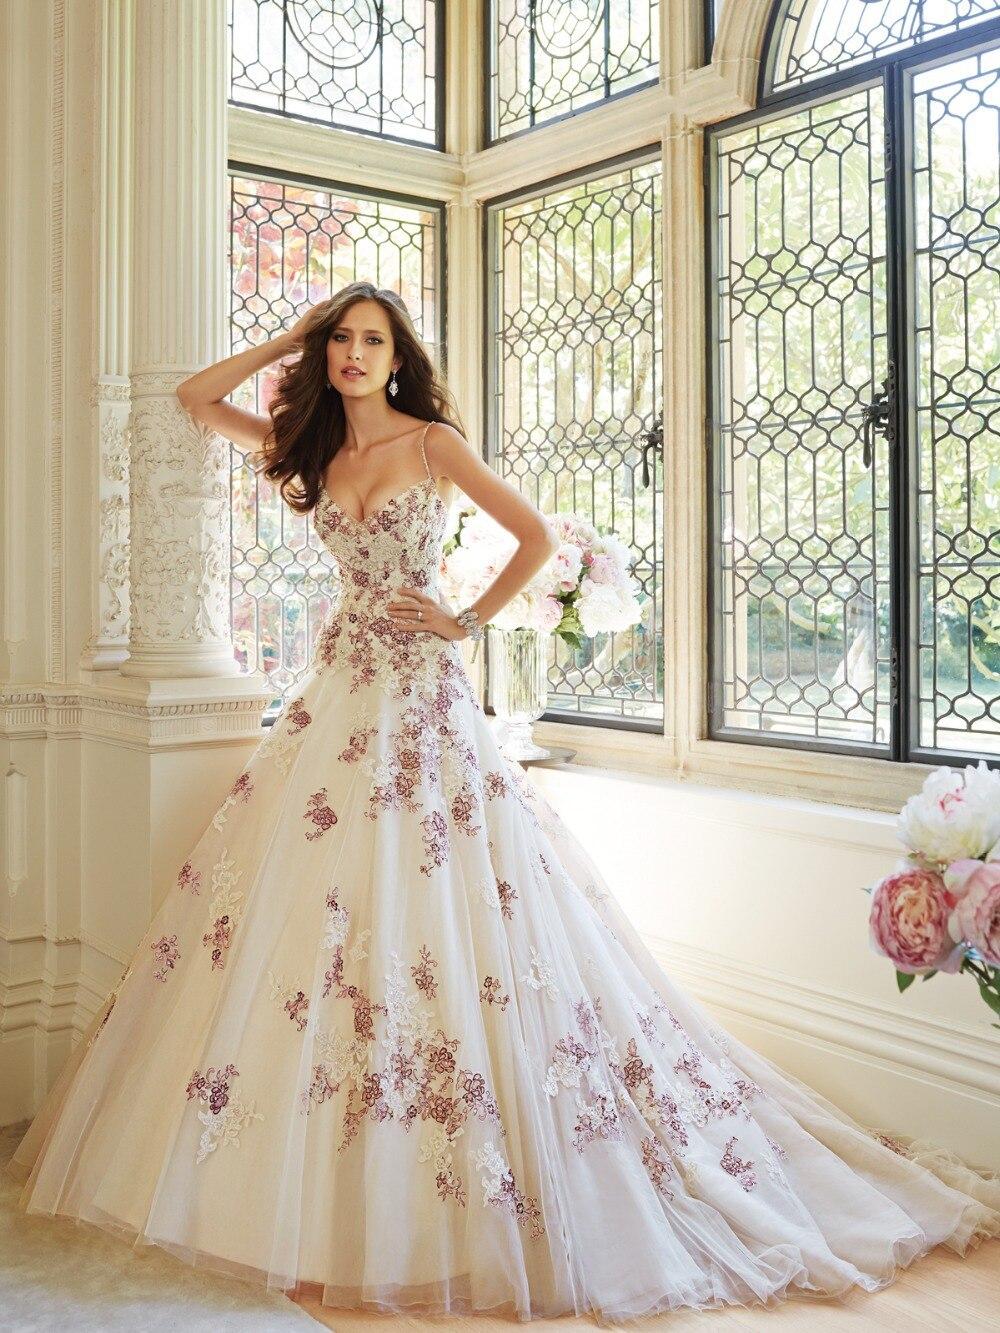 New Flowers Appliques Wedding Dress Purple And White Wedding Dresses